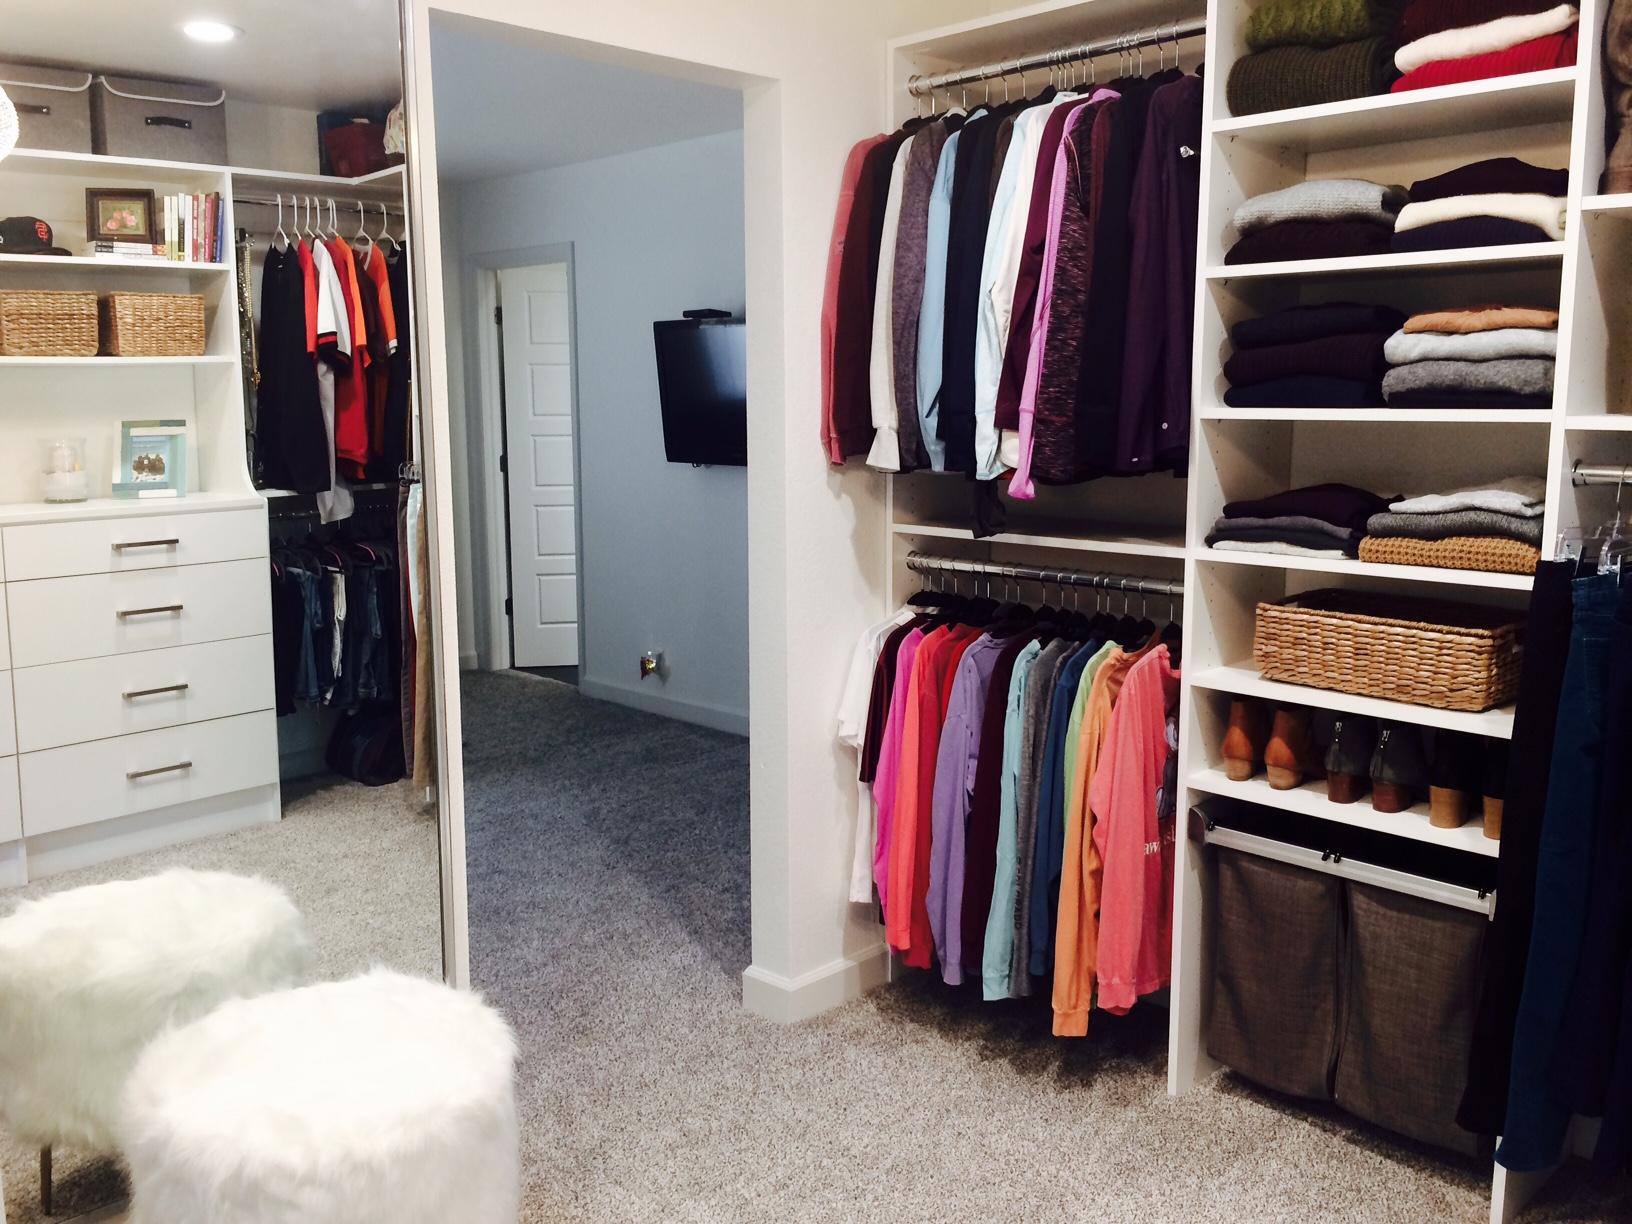 Dreaming of a Bedroom Closet Conversion? - Closets of Tulsa Can Help!